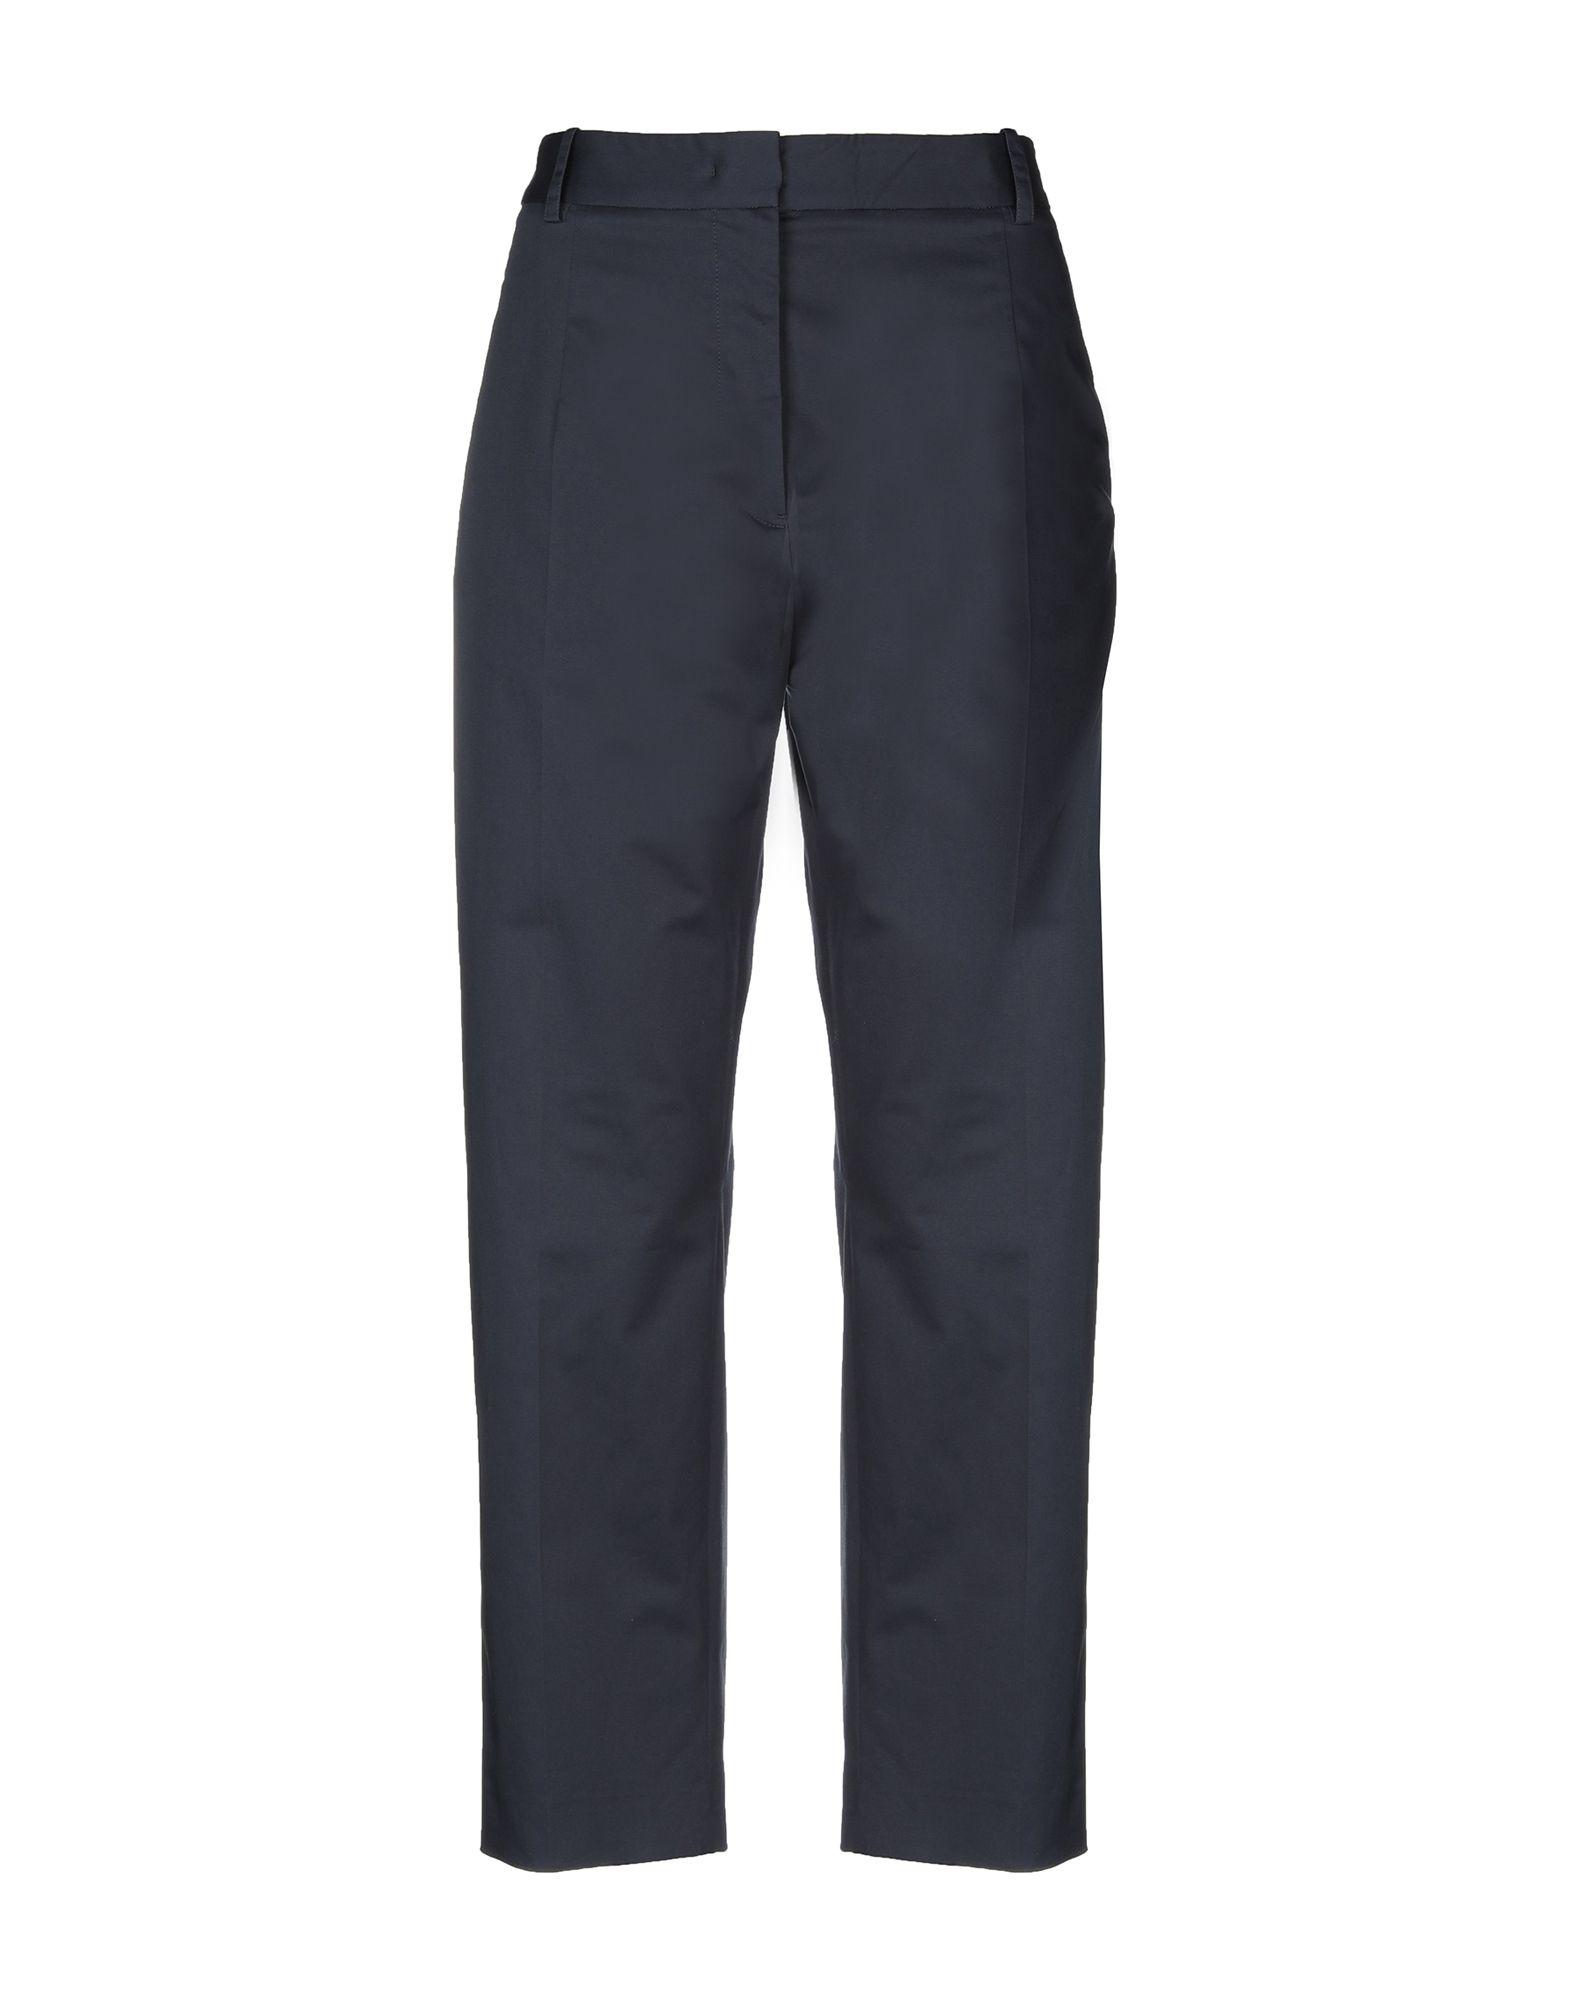 Pantalone Jil Sander donna - 13249549FI 13249549FI